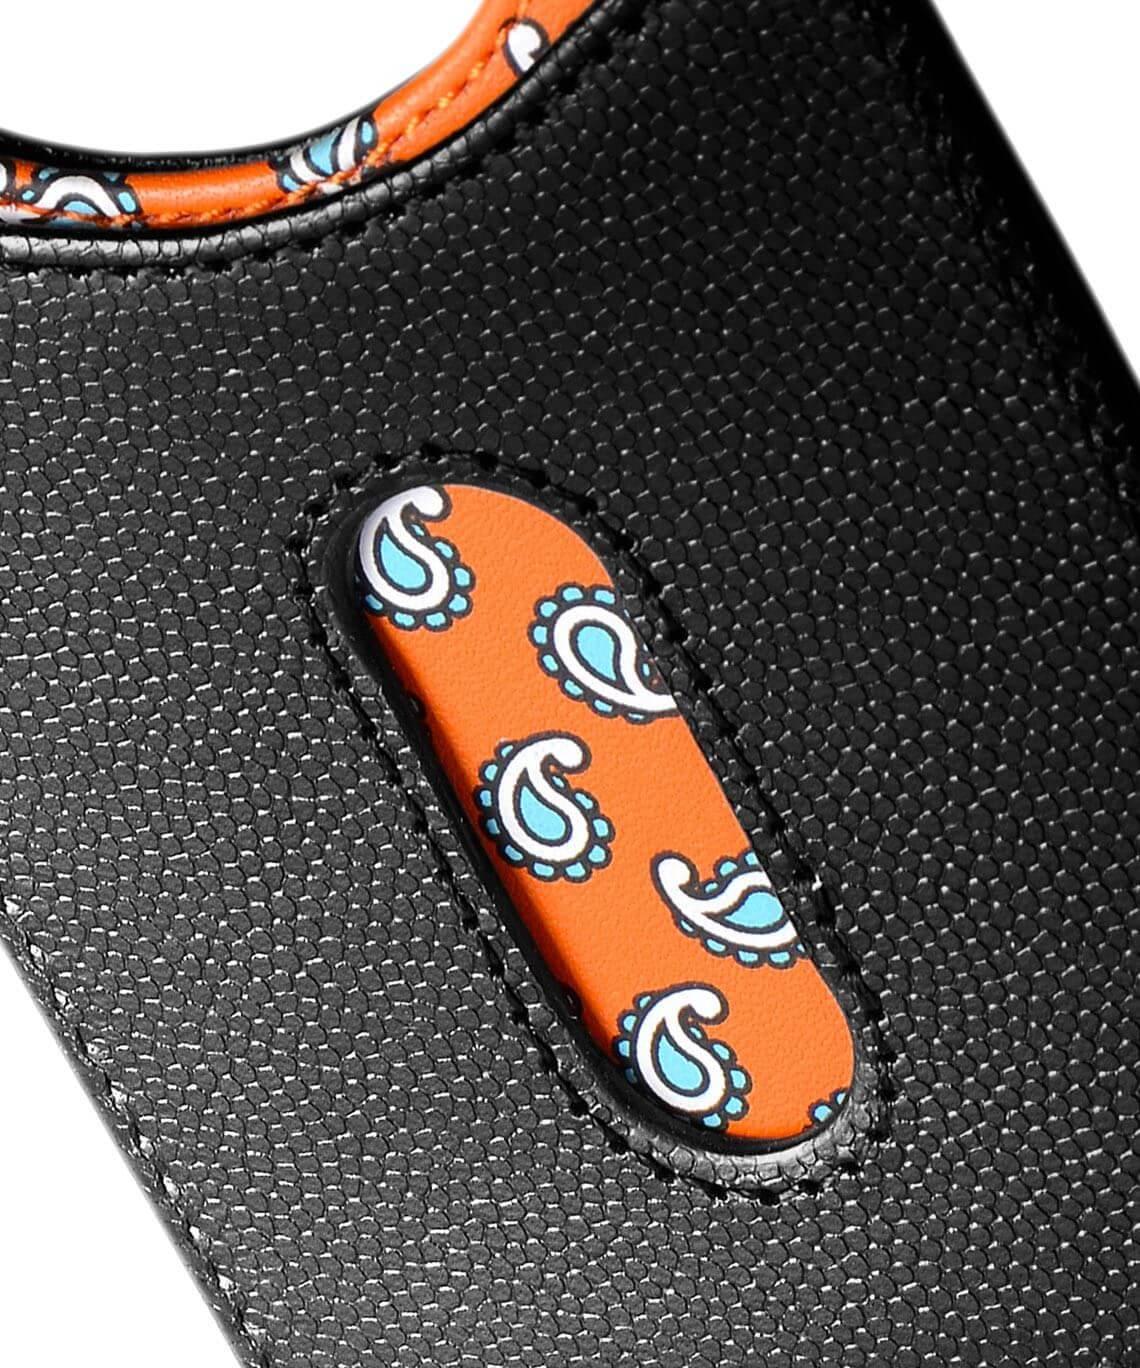 Access Credit Card & Money Clip - Black / Orange Paisley Closeup